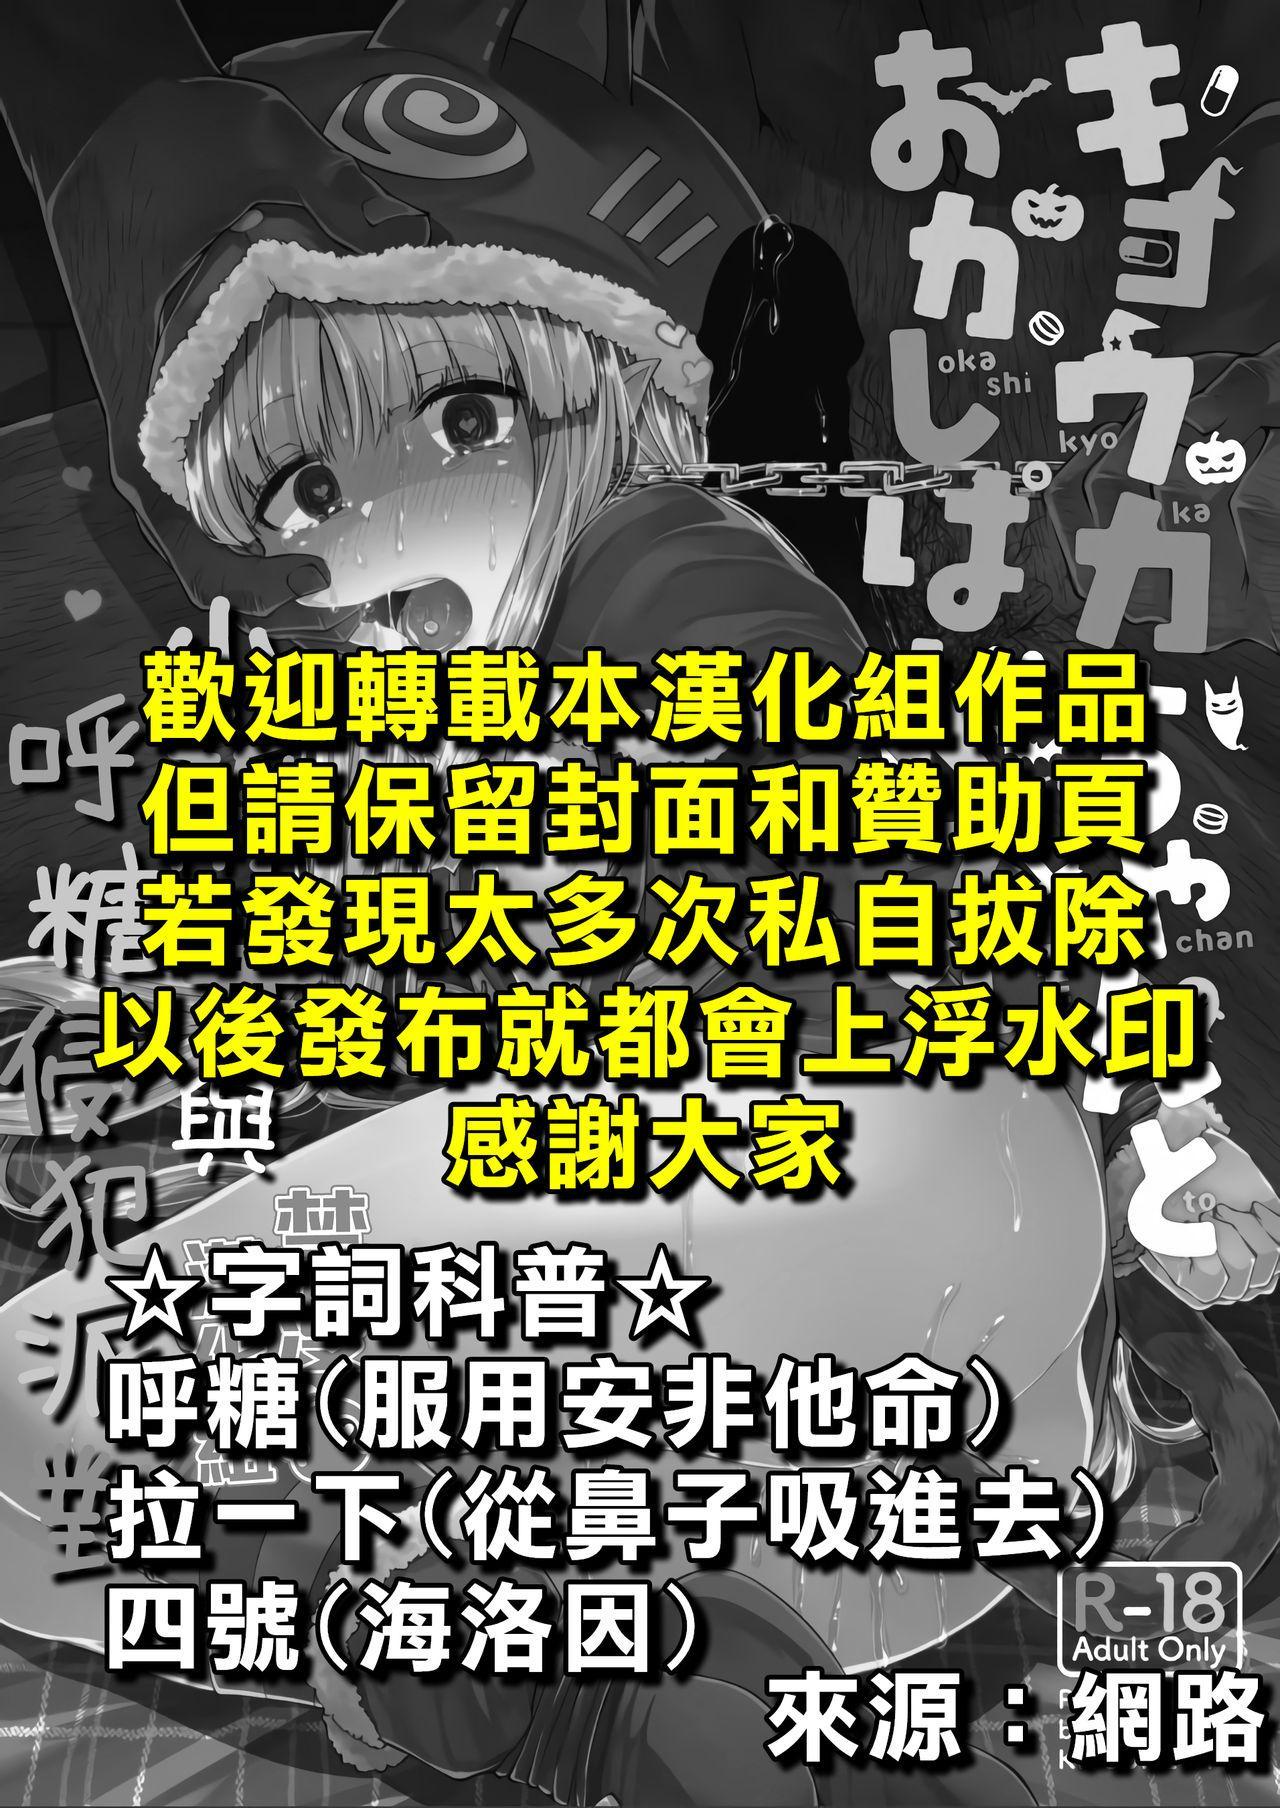 Kyouka-chan to Okashi Party | 小鏡華與呼糖侵犯派對 1